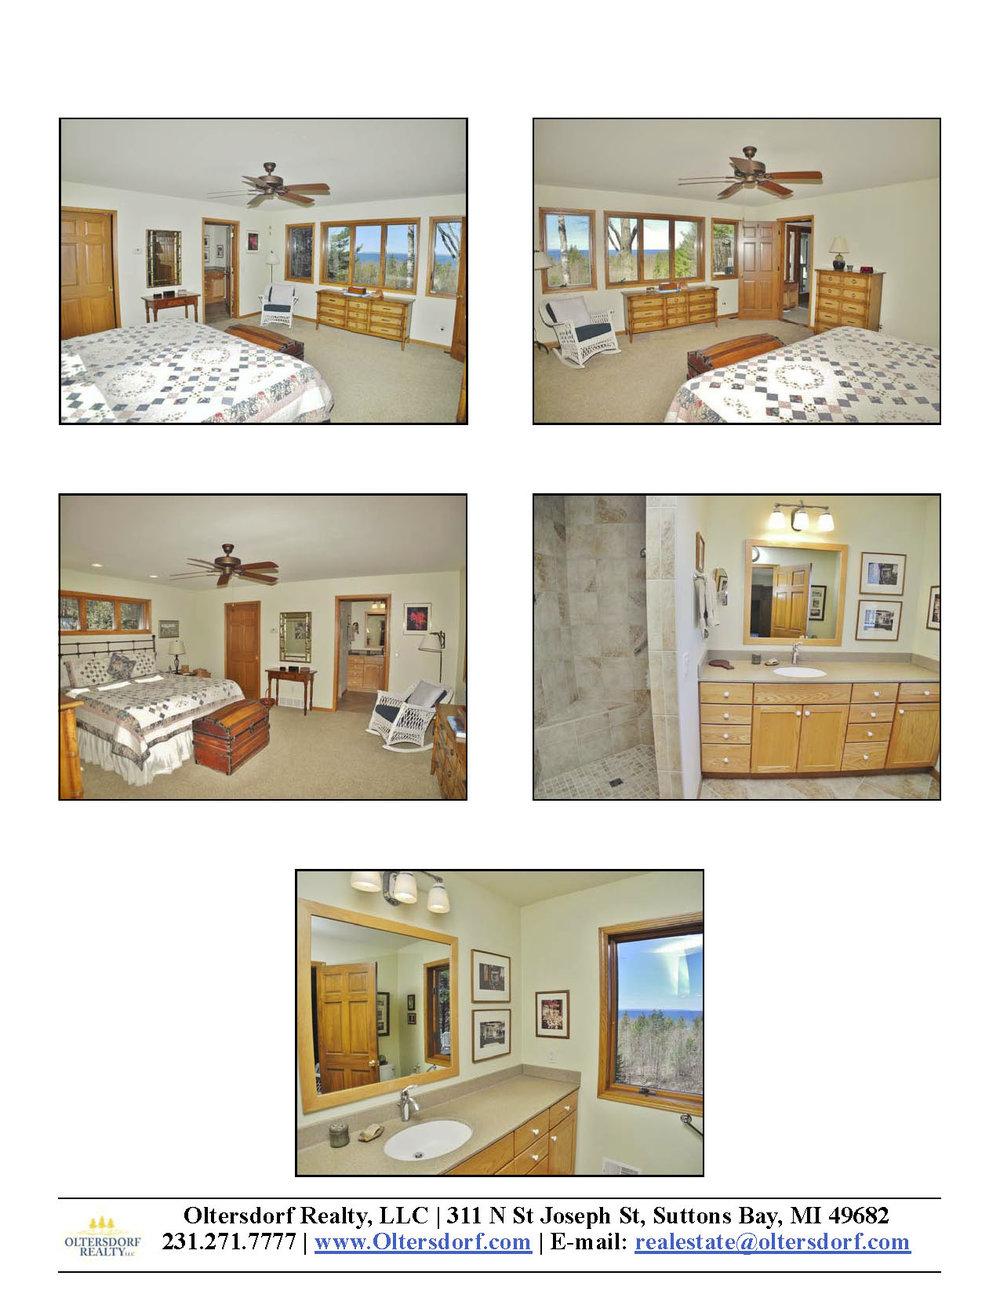 564 S Woodsmoke Drive, Lake Leelanau, MI – Sunset Lake Michigan Water Views - For Sale by Oltersdorf Realty - Marketing Packet (6).jpg